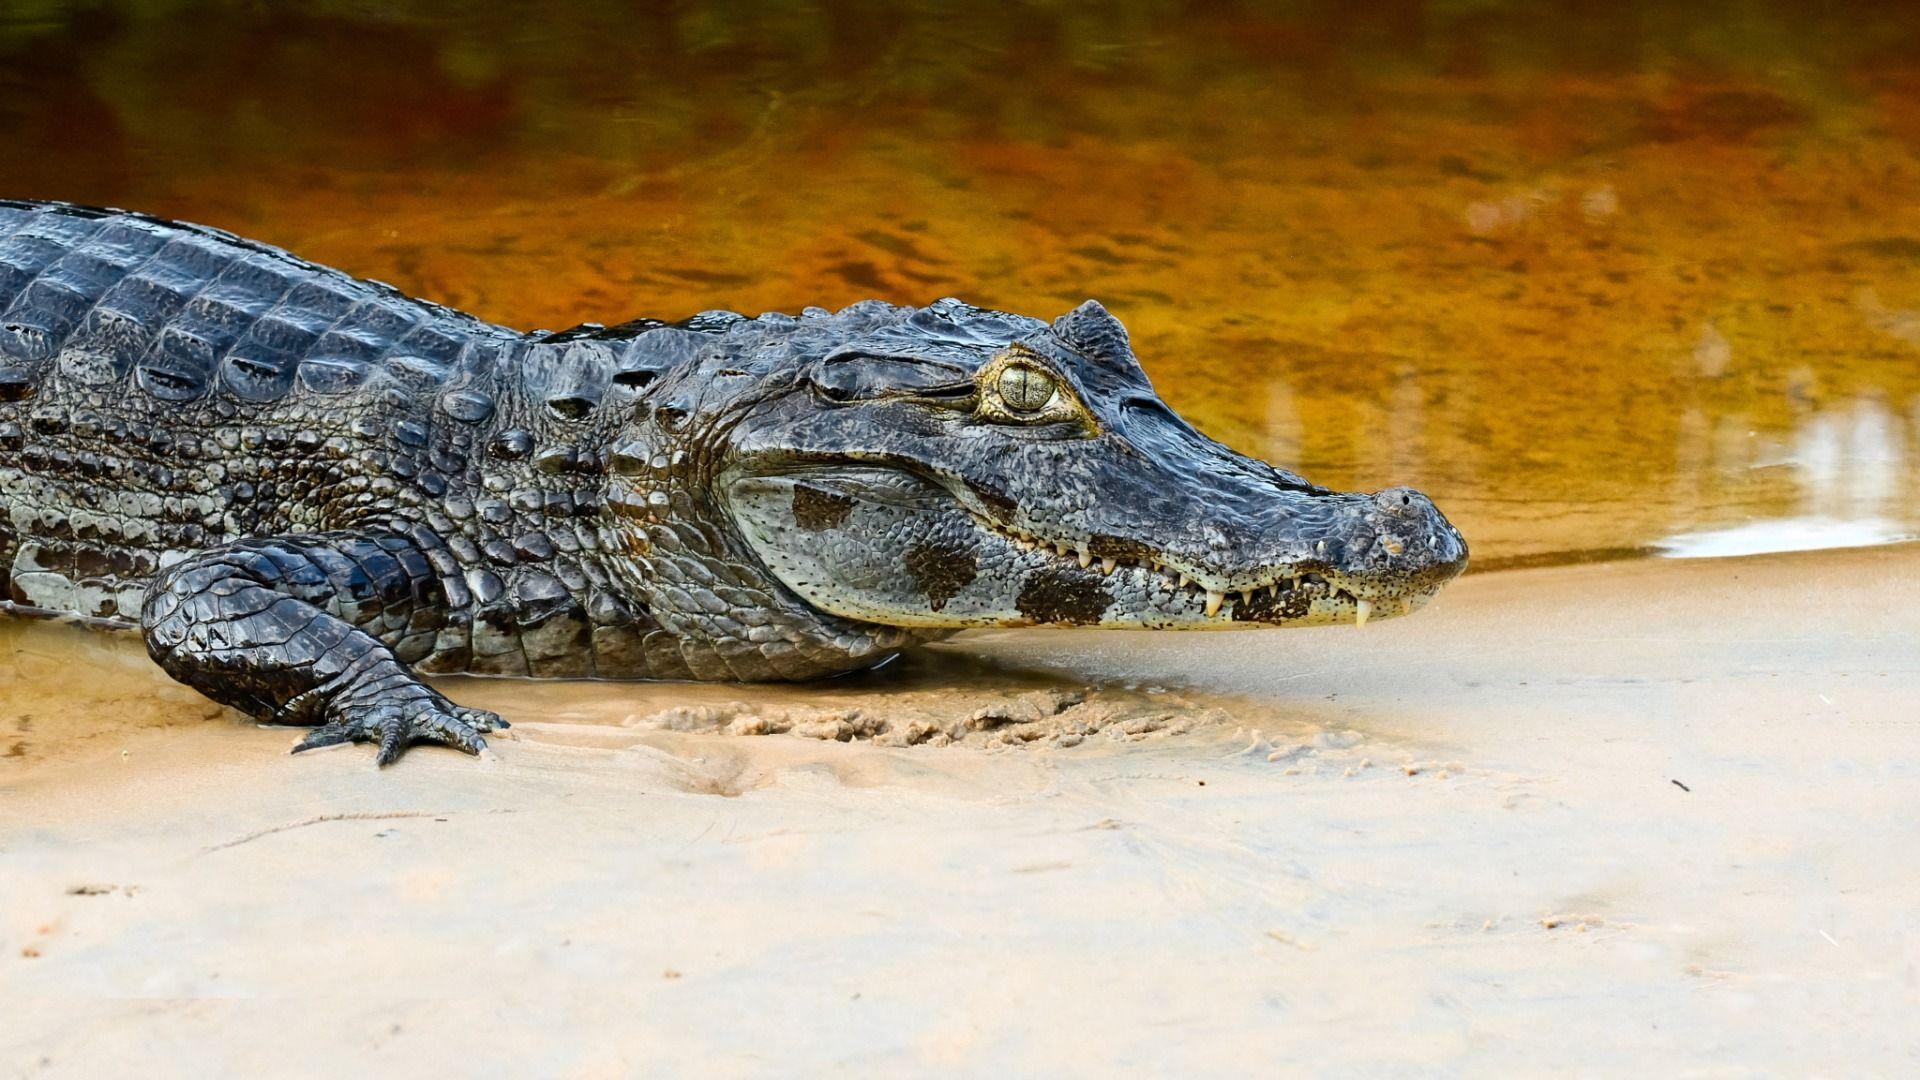 Photo Of Crocodile And Alligator